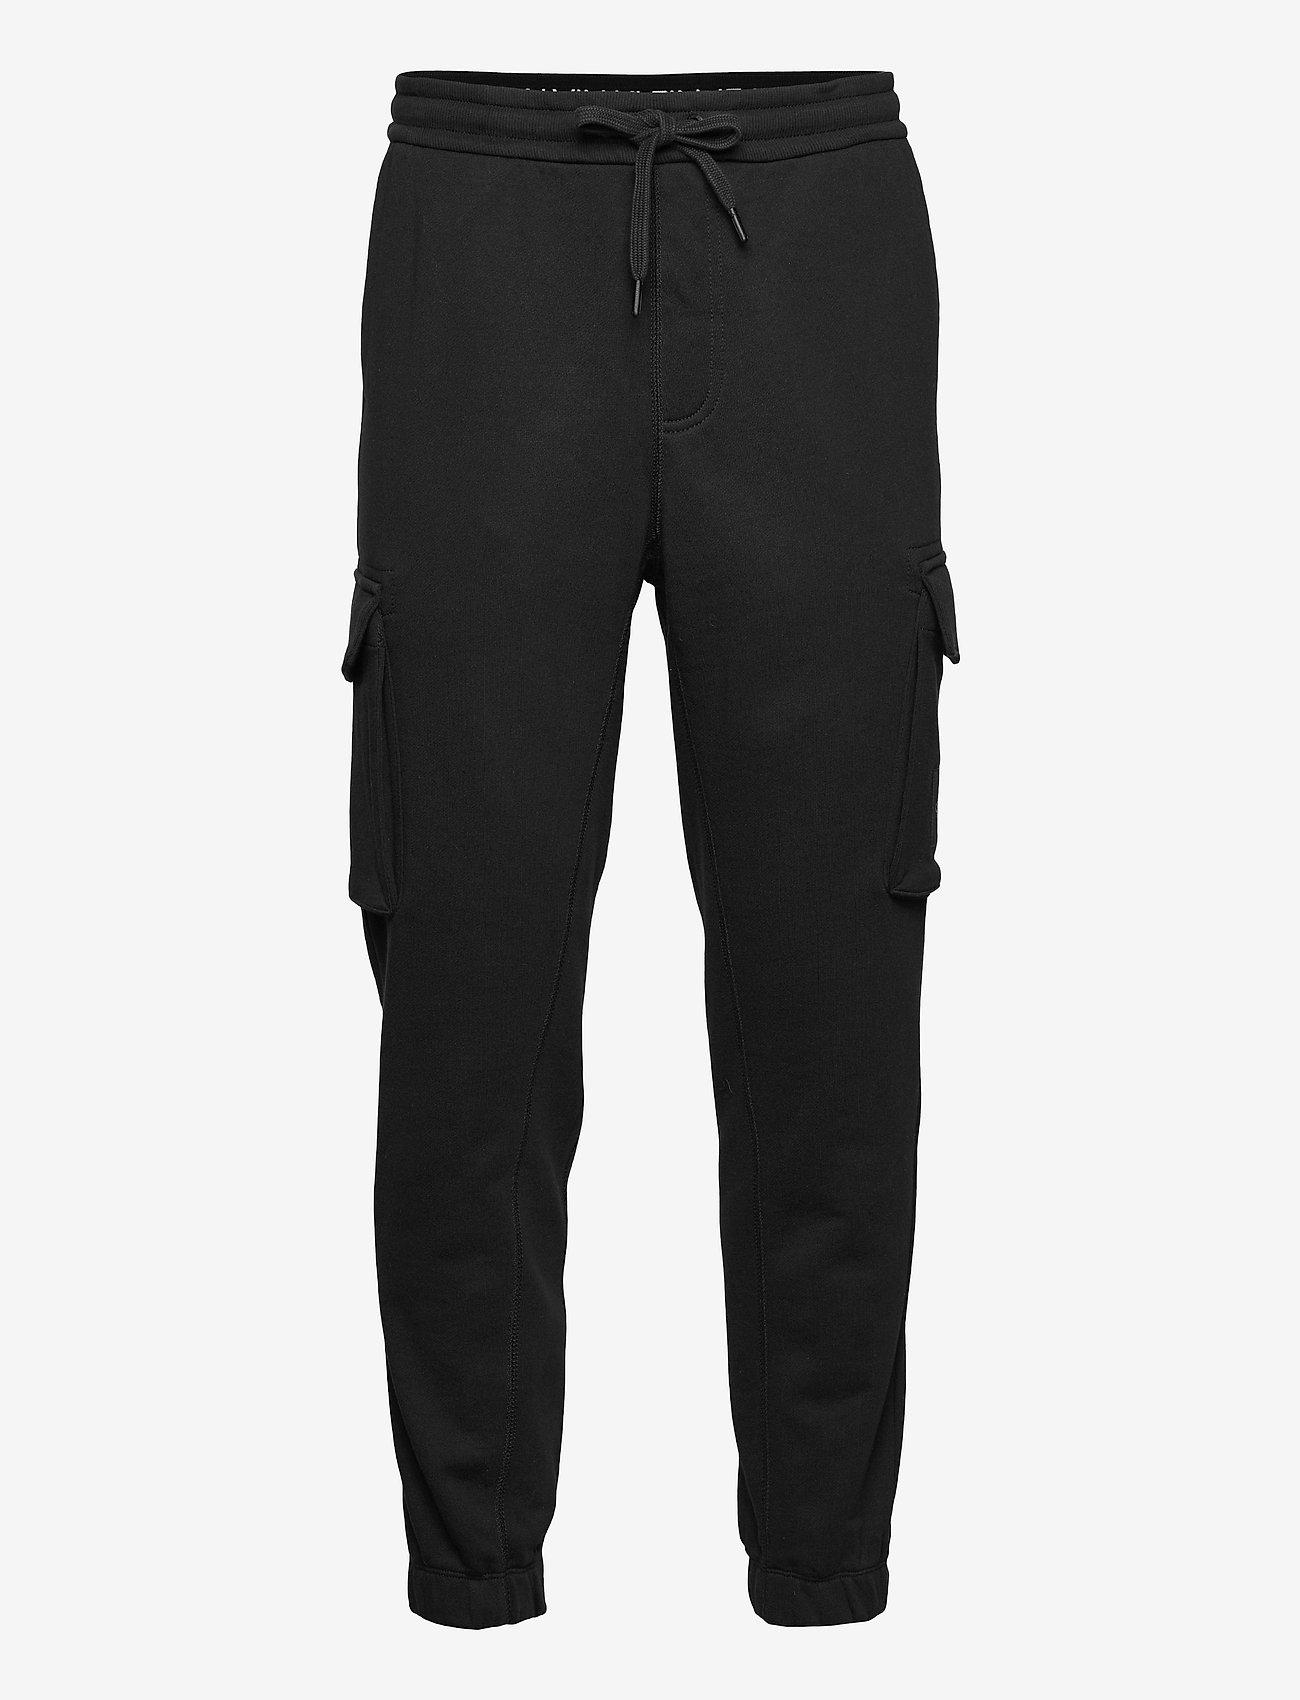 Calvin Klein Jeans - CARGO BADGE FLEECE PANT - cargobroek - ck black - 0